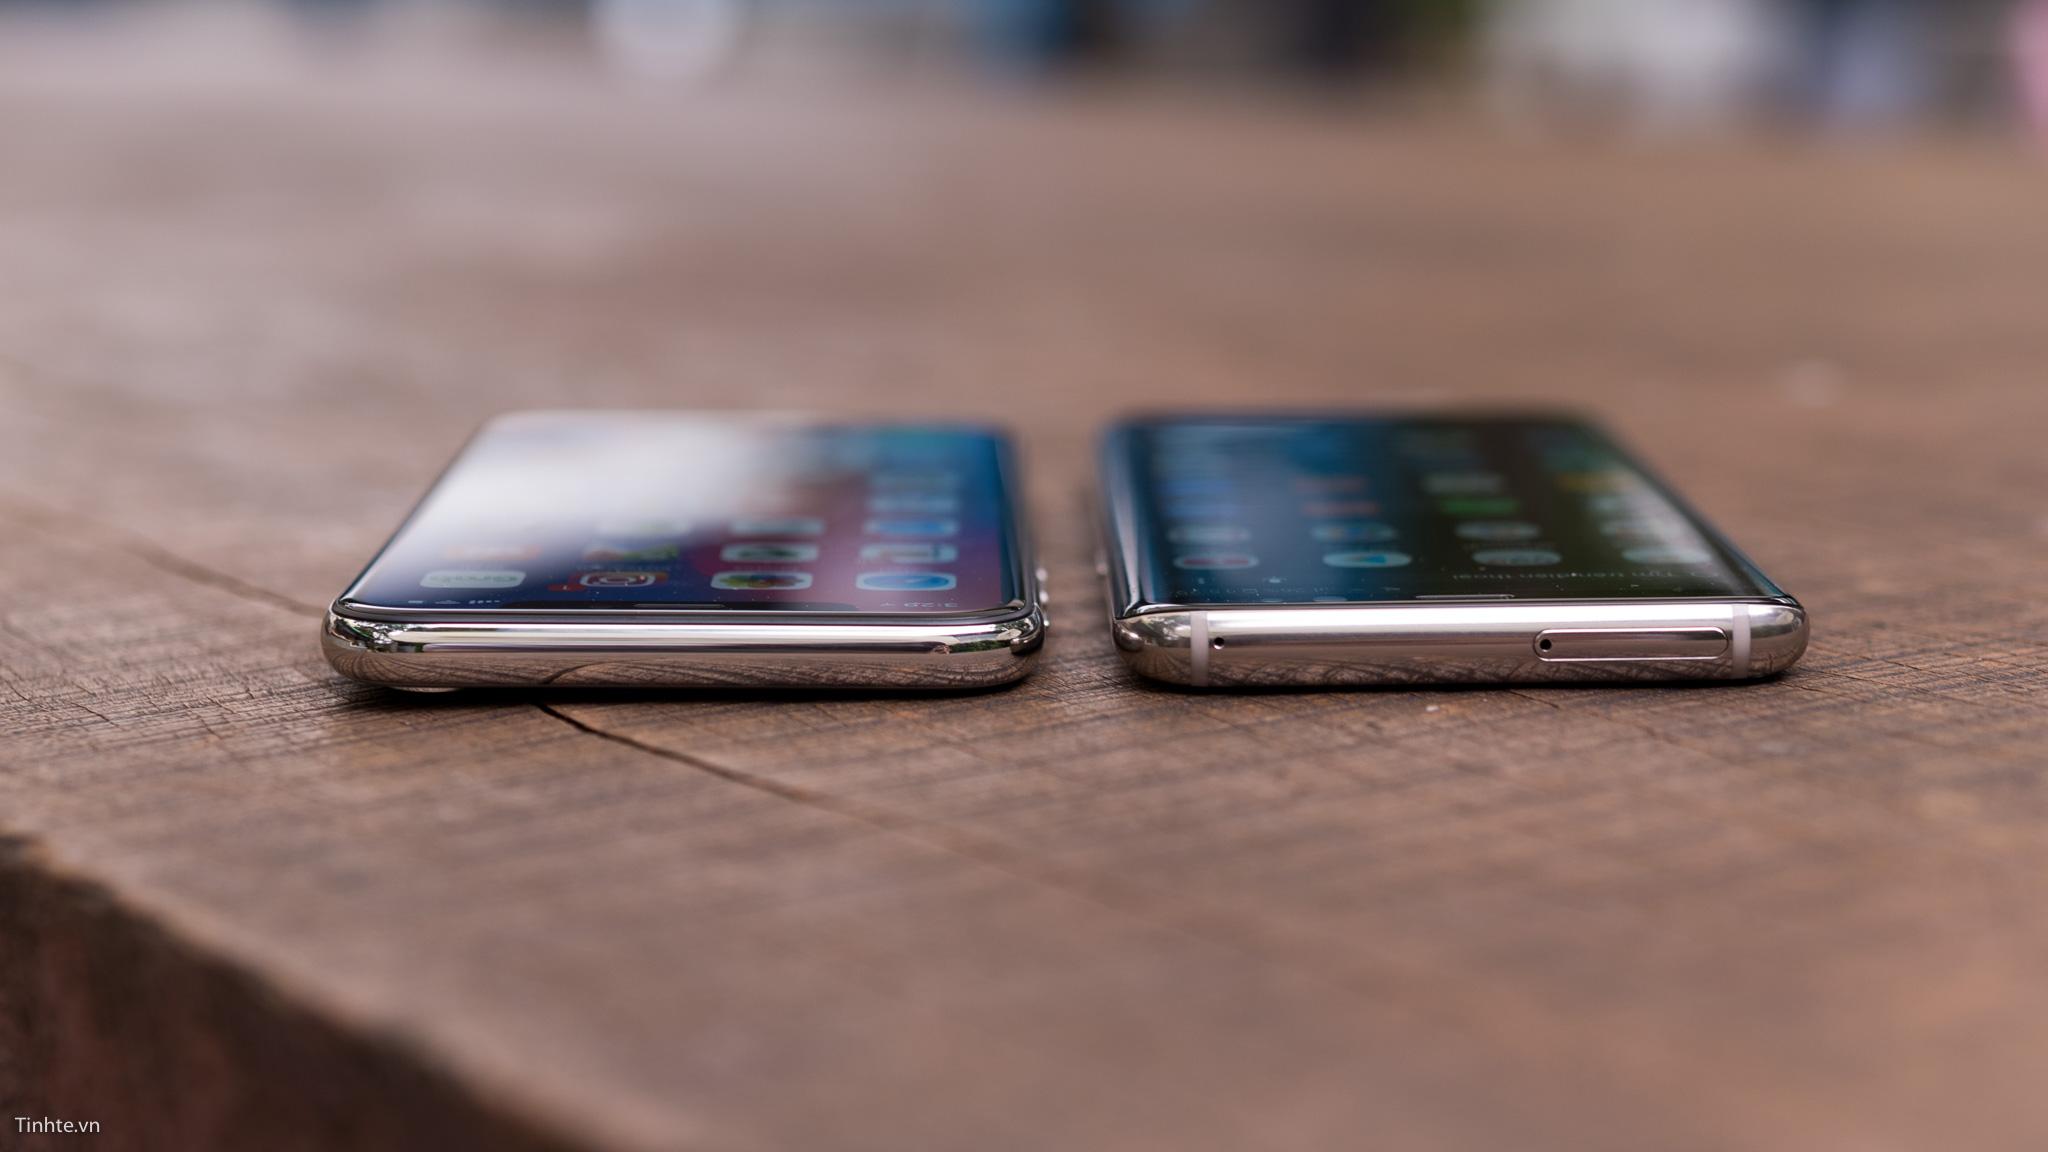 iphonex-s8-tinhte-8.jpg